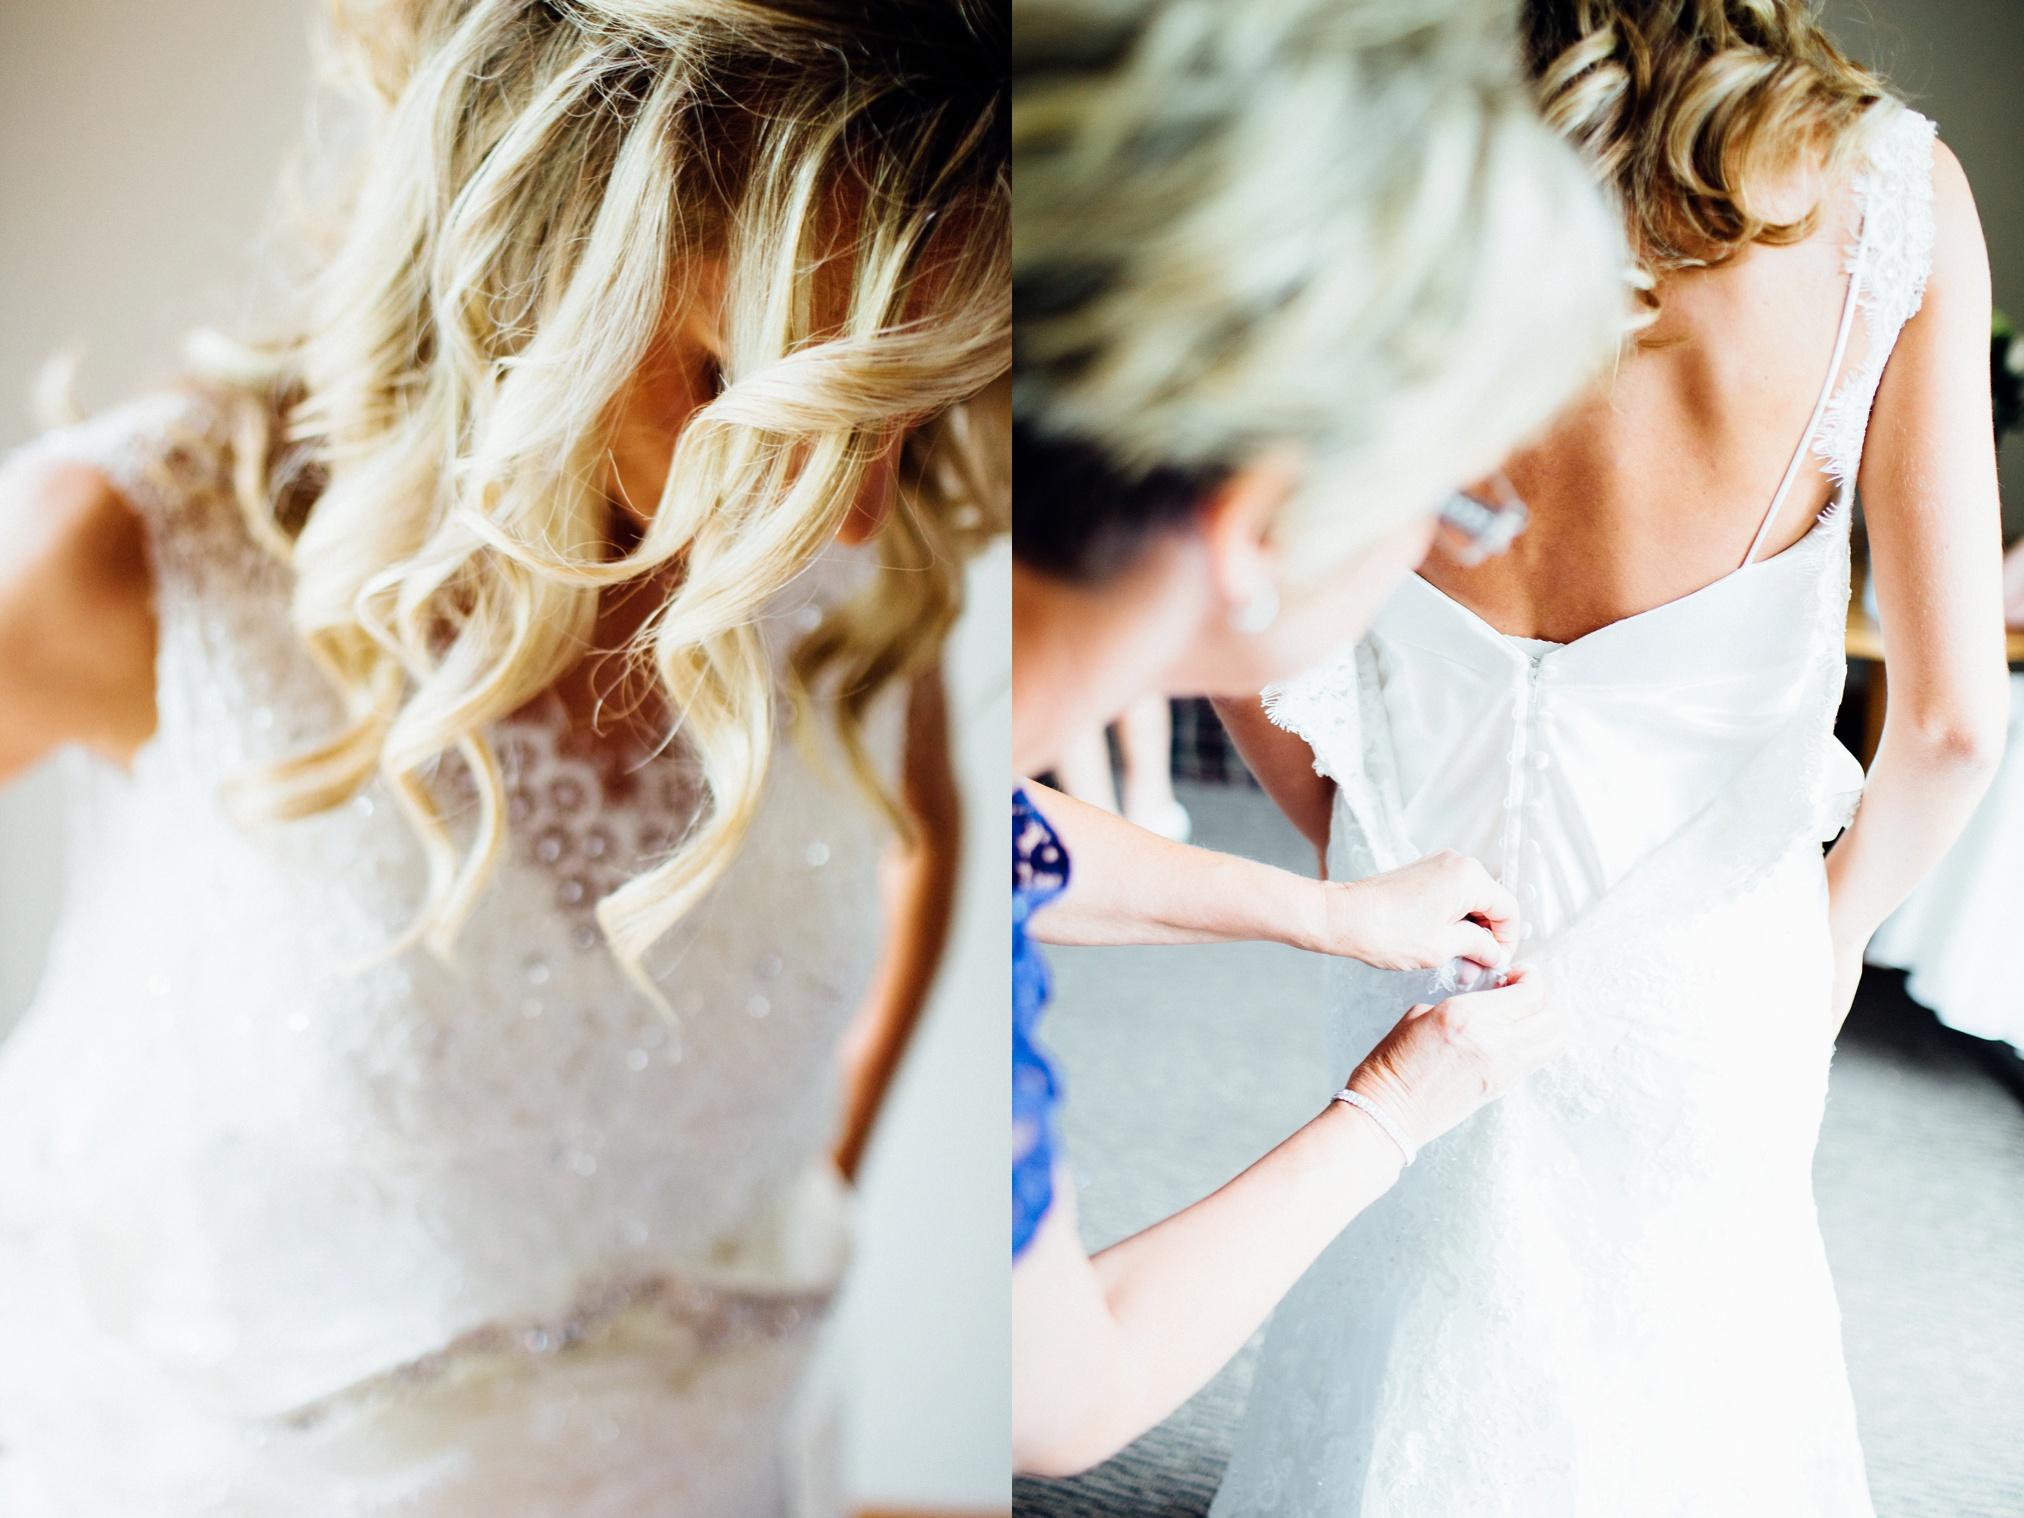 schmid_wedding-54.jpg